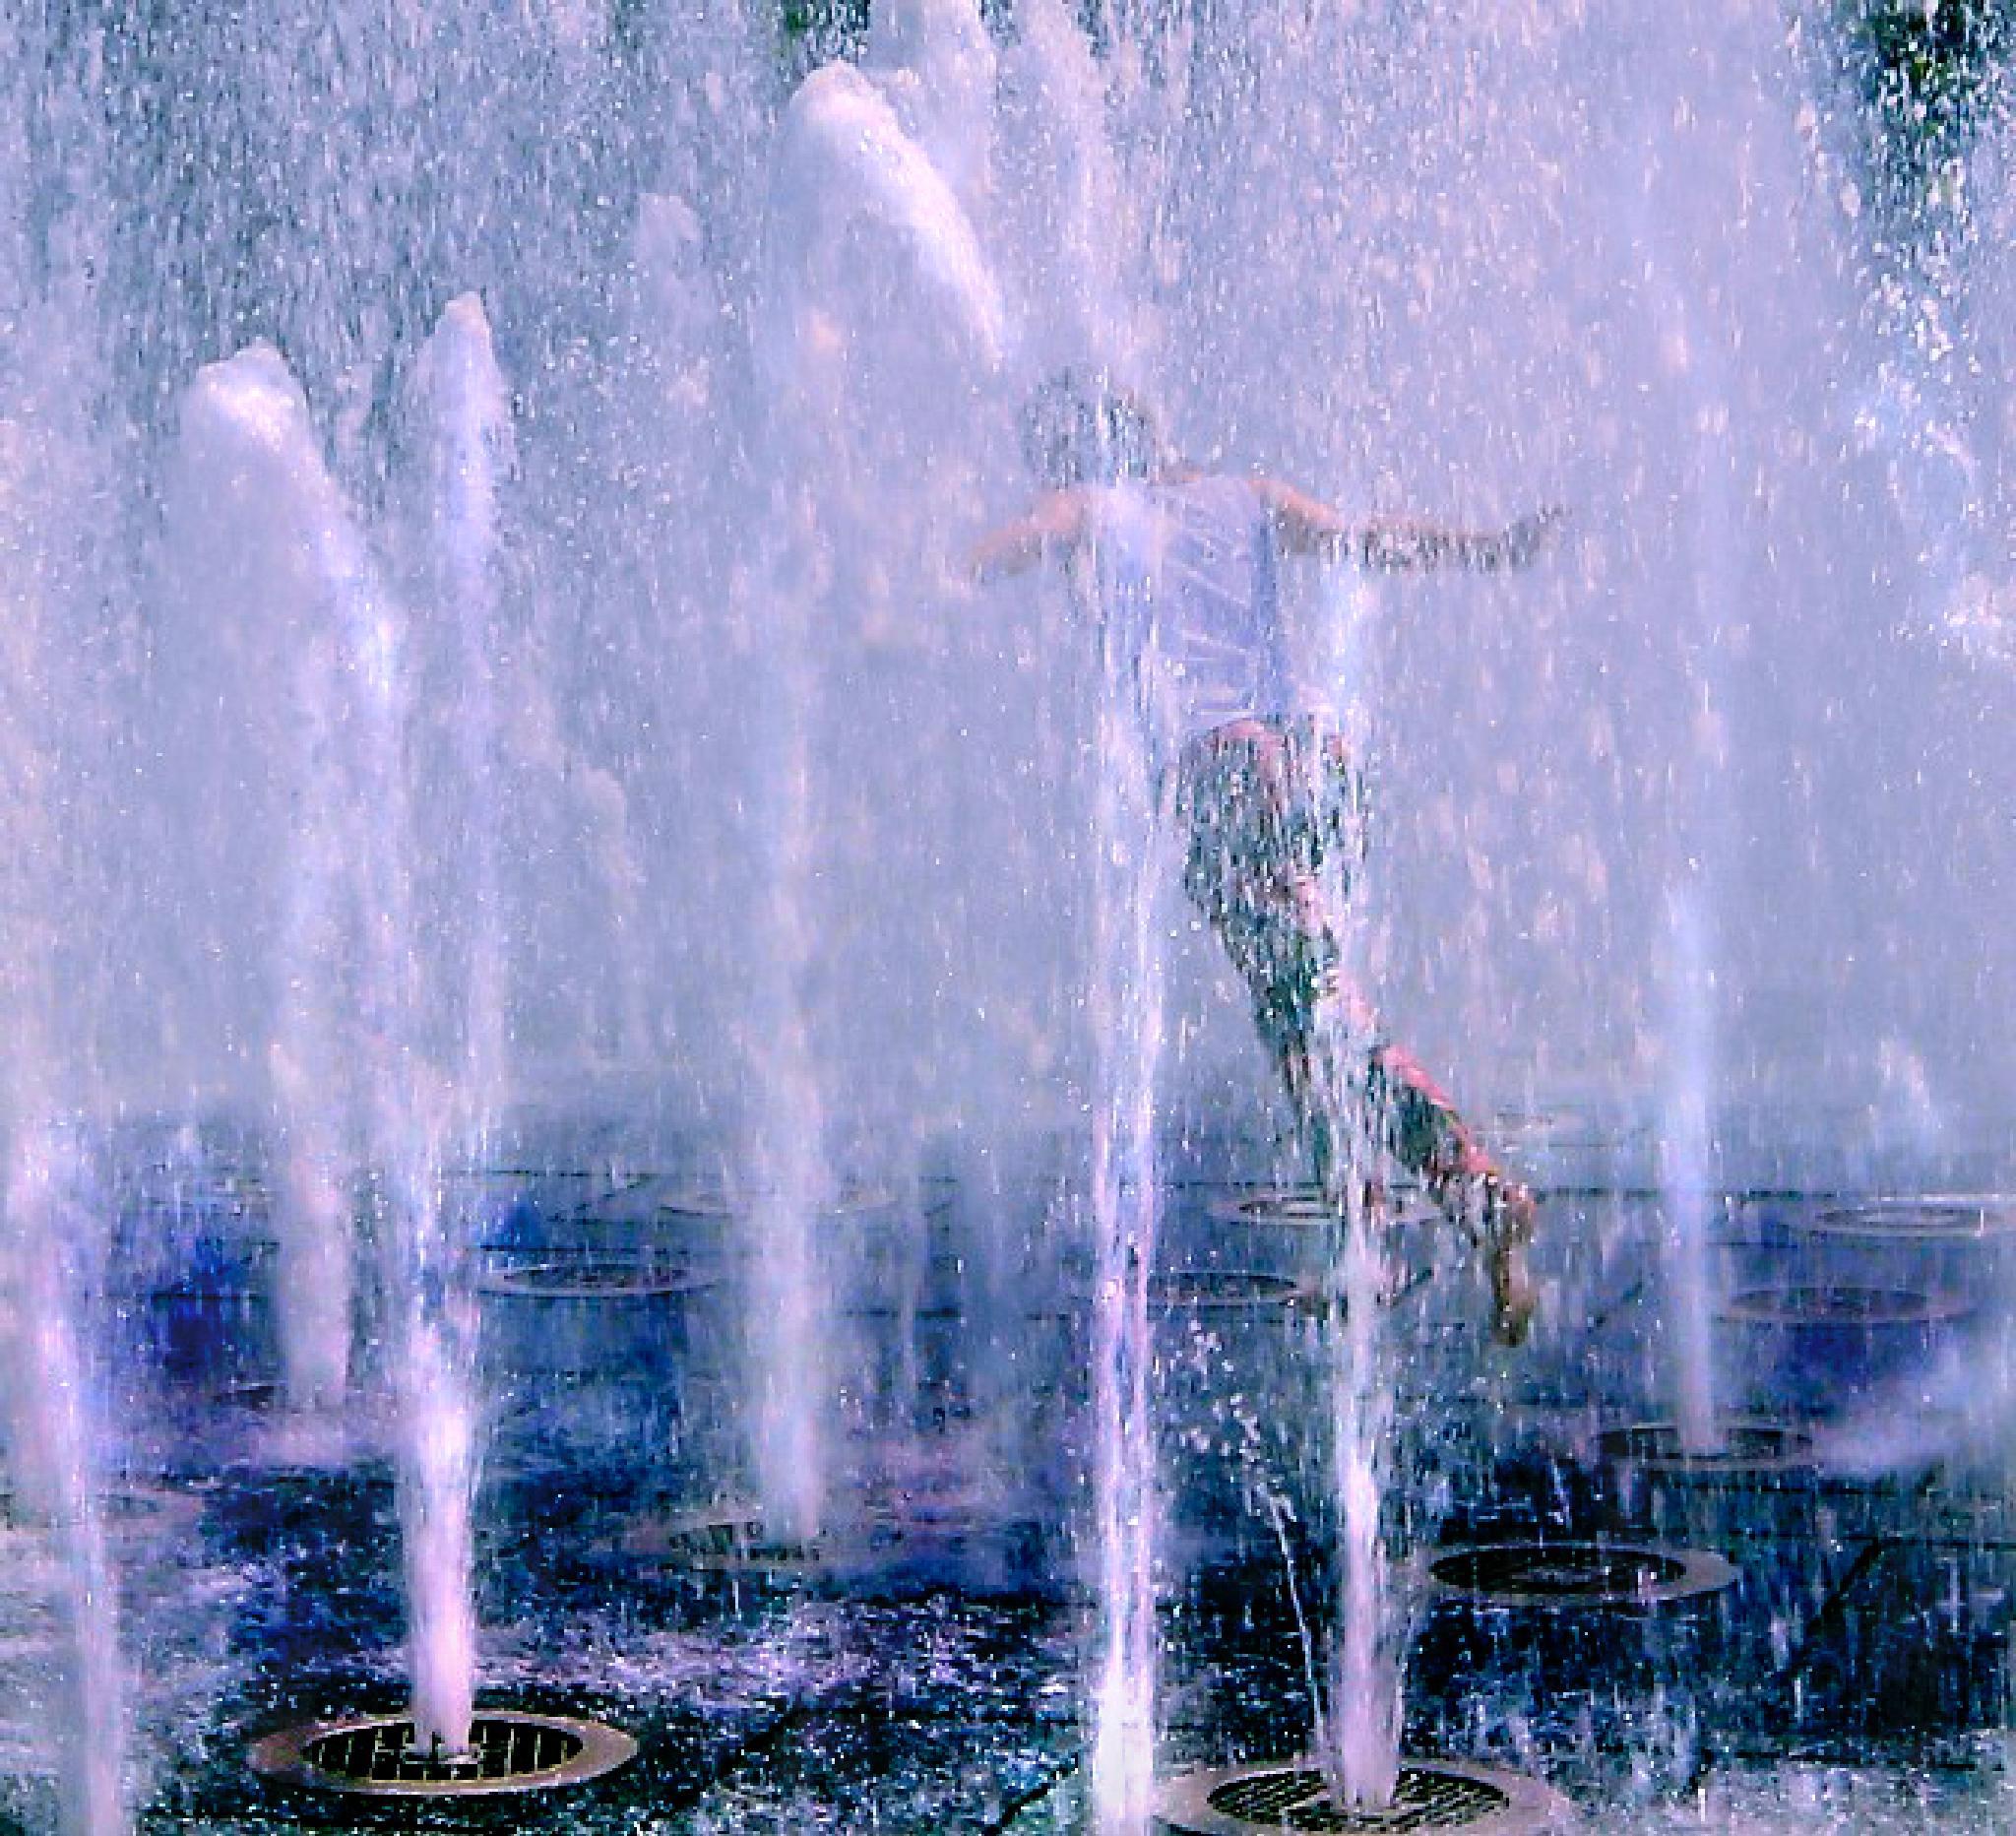 Fountain Run by t.gwin